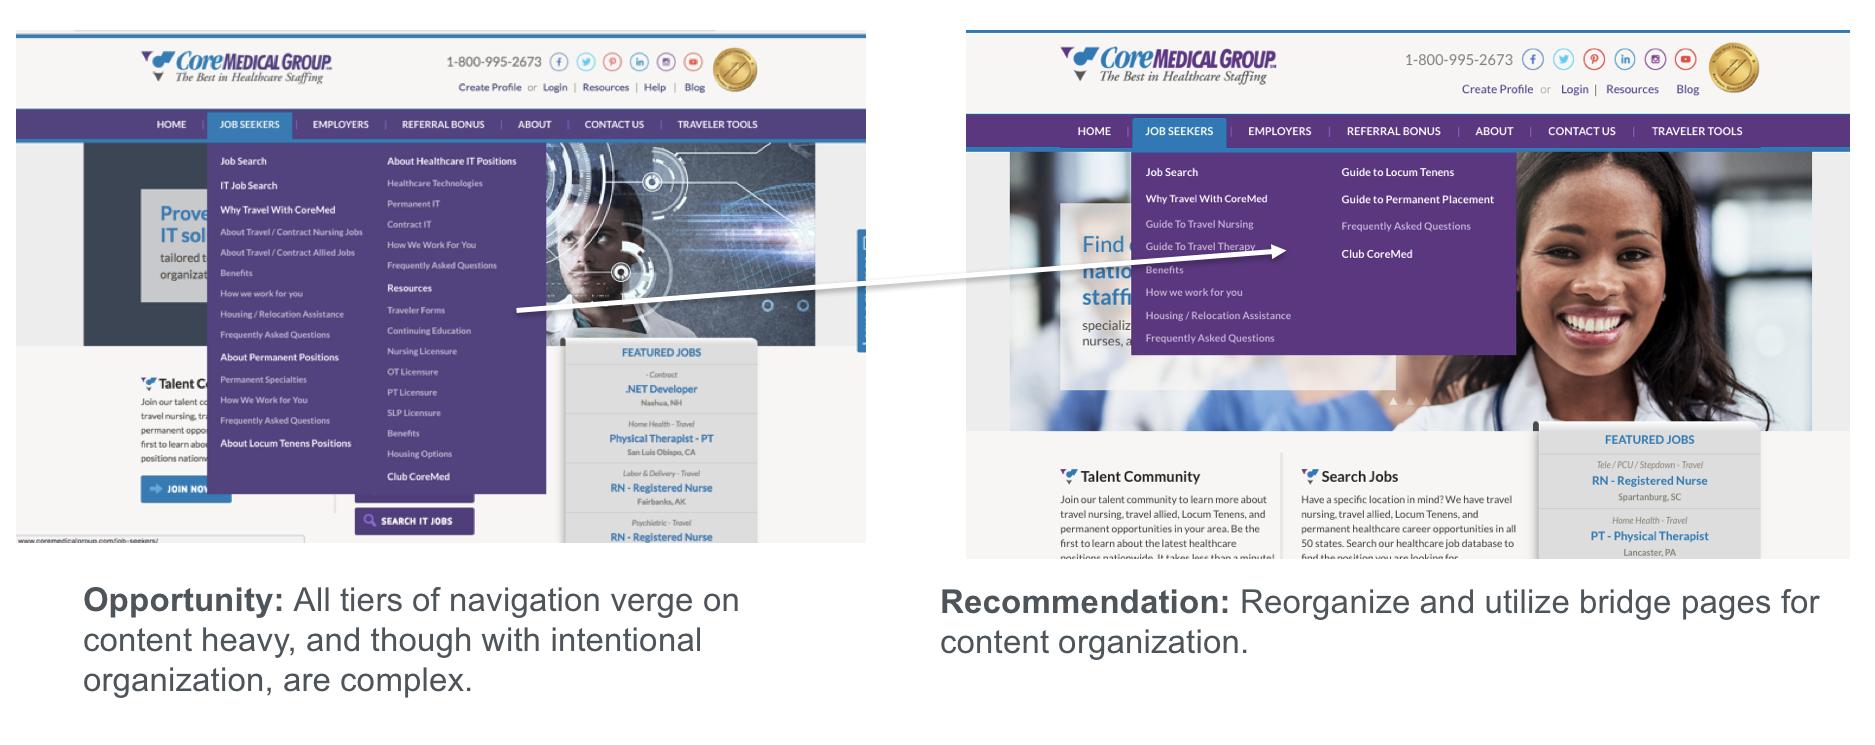 Core Medical Group Website Marketing